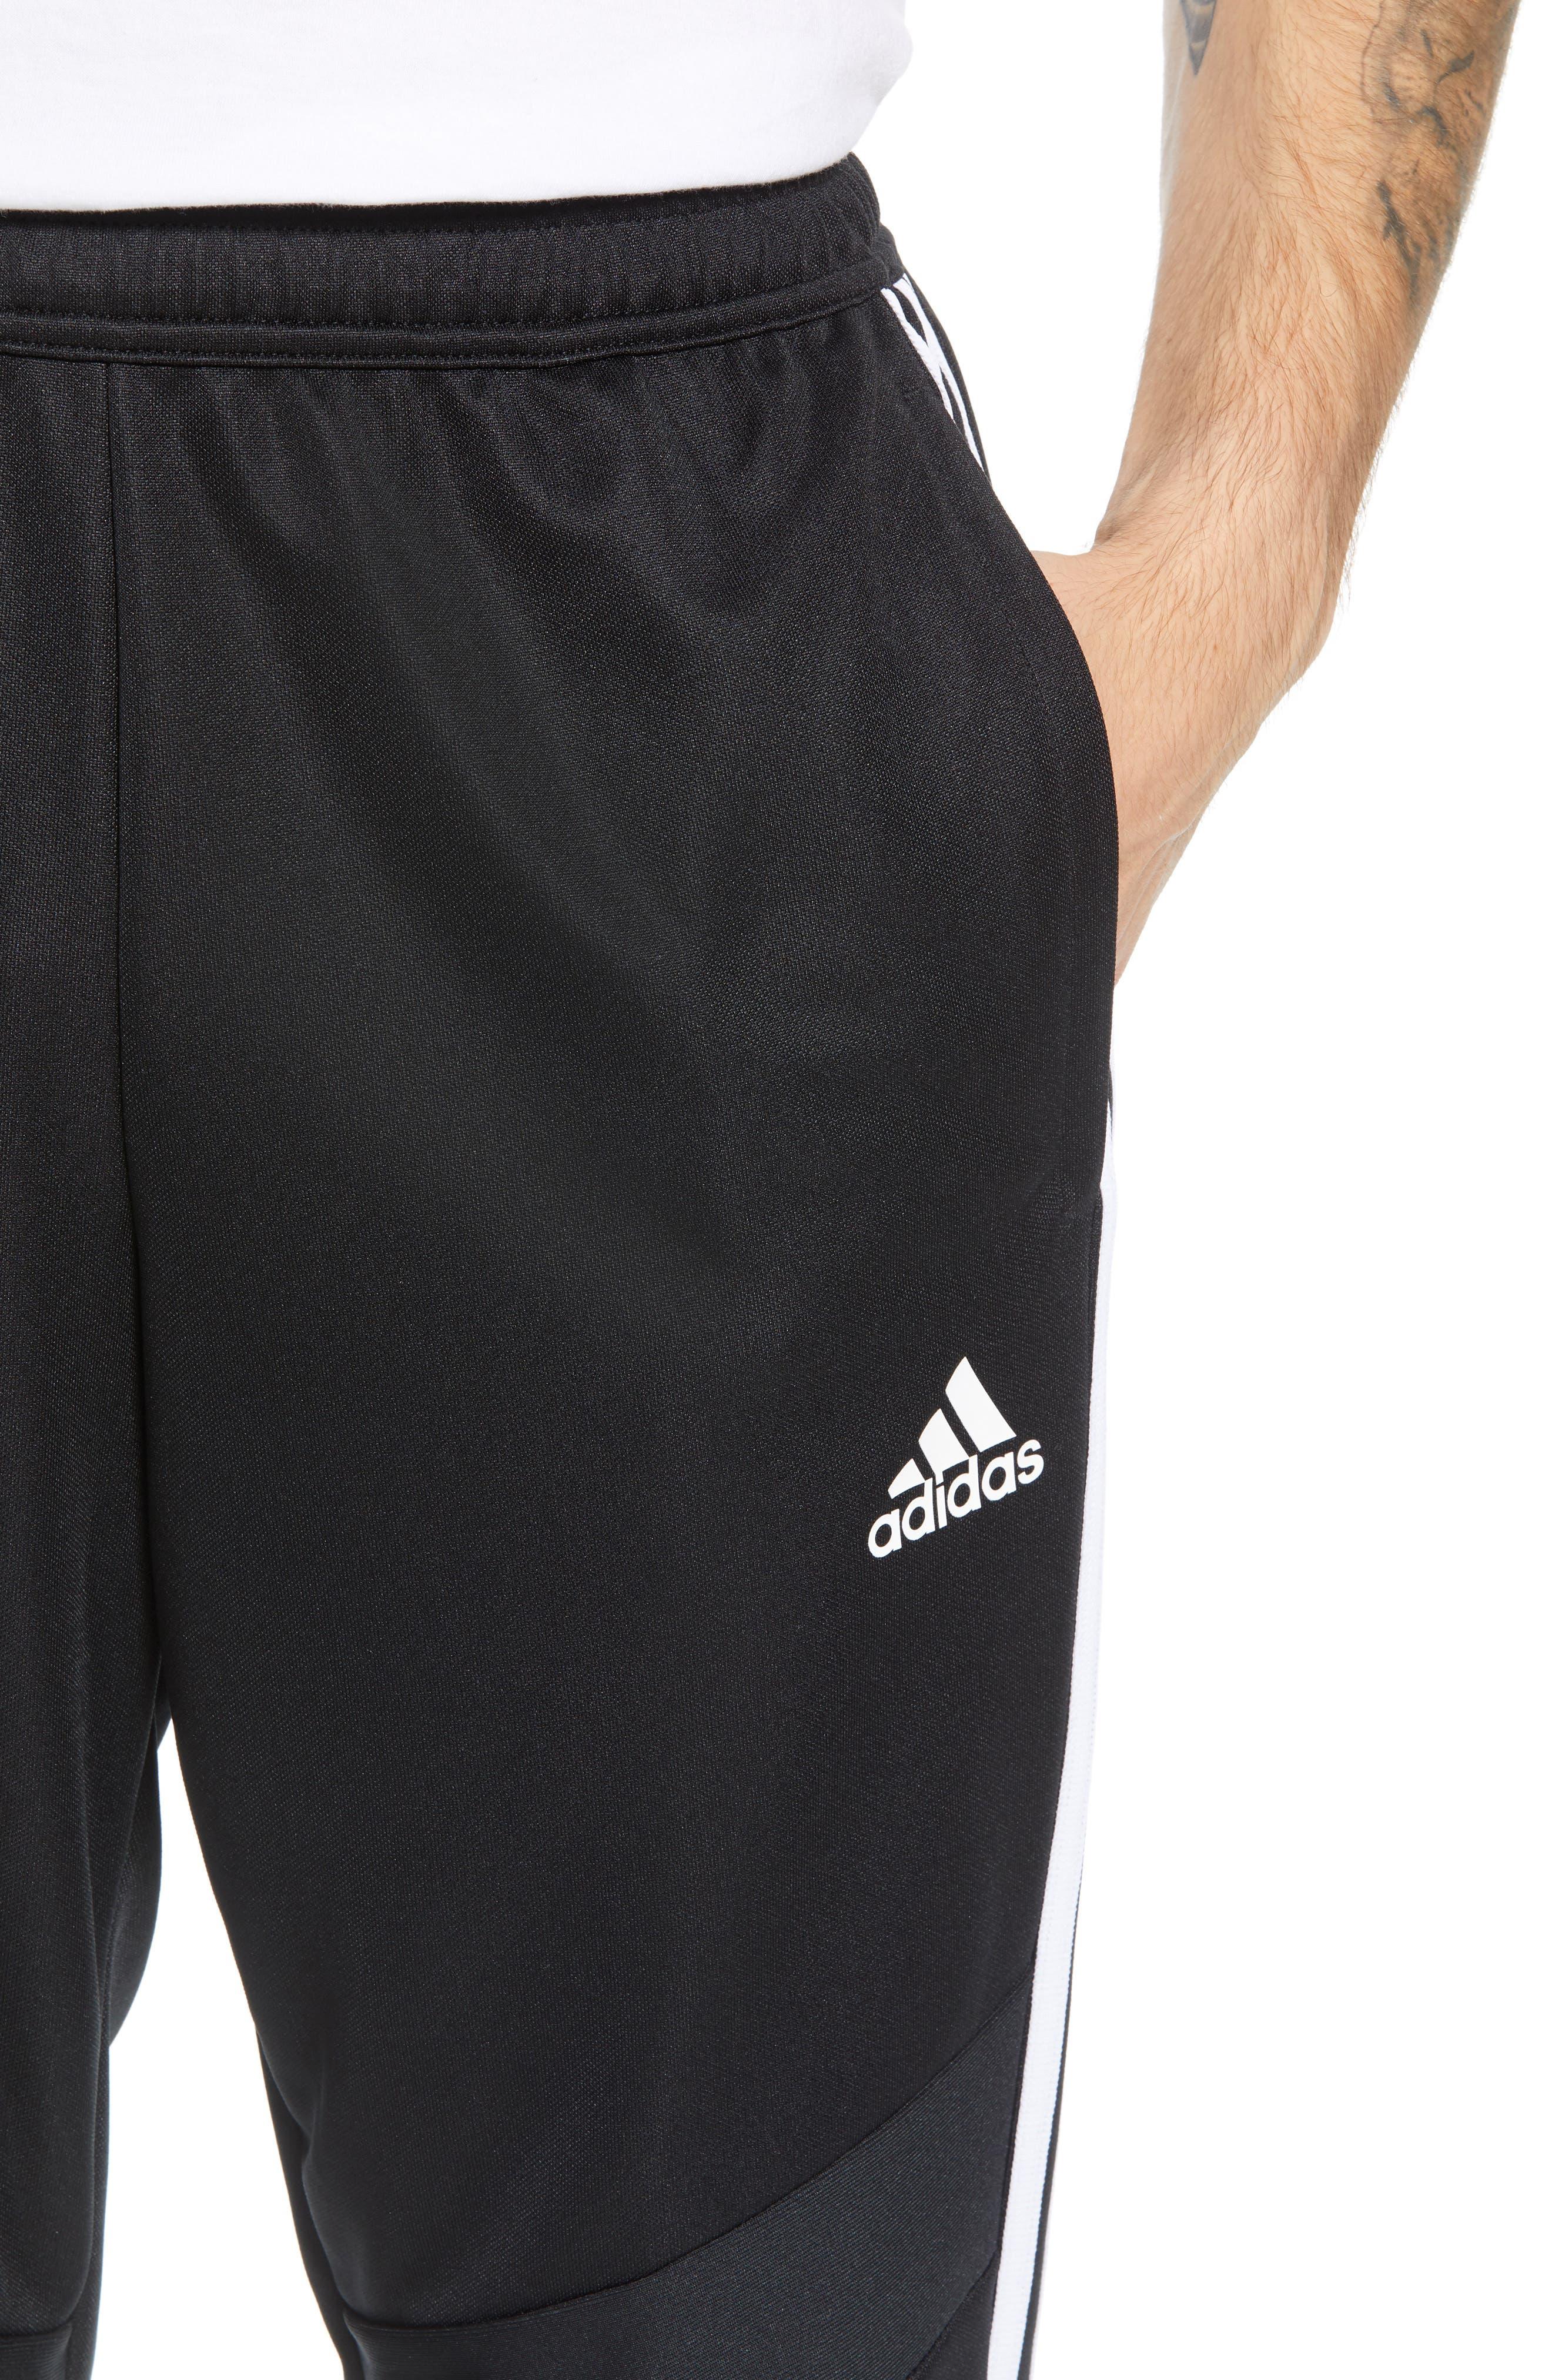 ADIDAS, Tiro Soccer Training Pants, Alternate thumbnail 5, color, BLACK/ WHITE